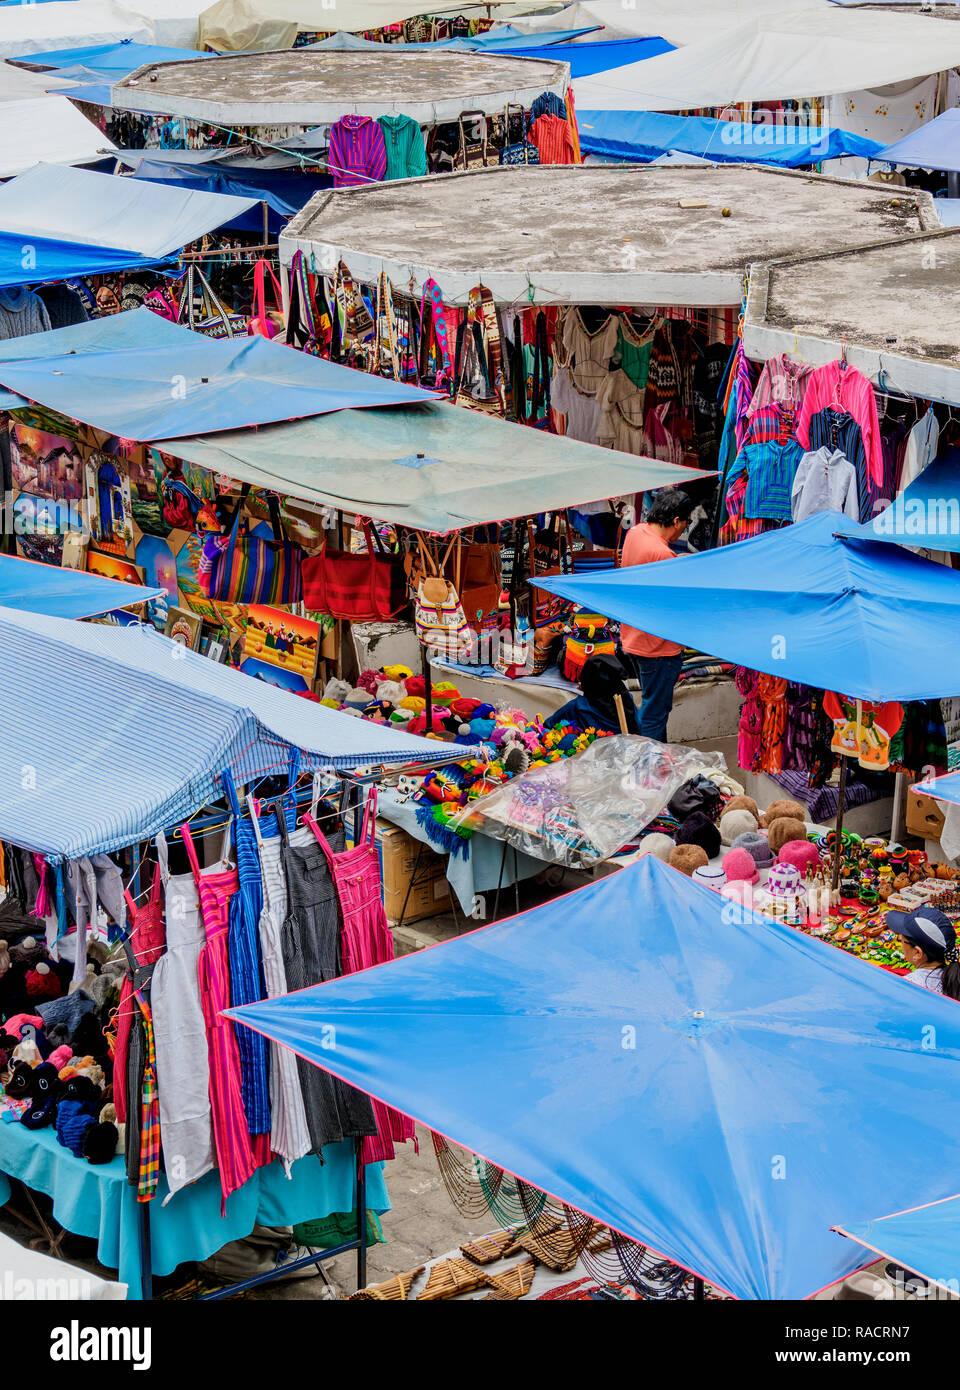 Saturday Handicraft Market, Plaza de los Ponchos, elevated view, Otavalo, Imbabura Province, Ecuador, South America - Stock Image